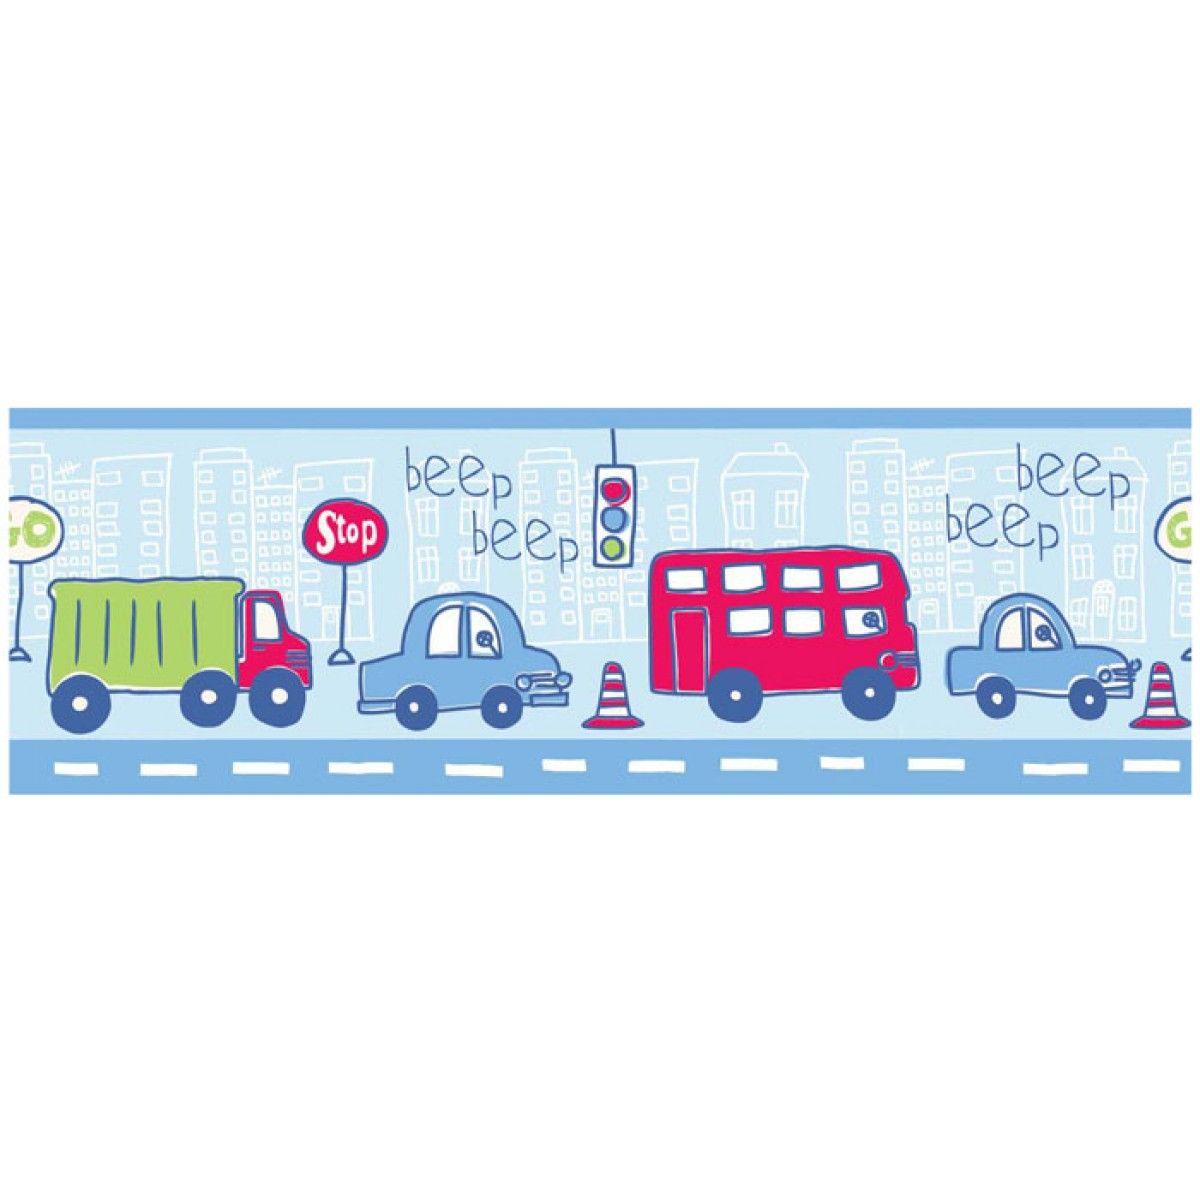 Thomas the tank engine wallpaper border - Beep Beep Cars And Vehicles 7 Inch Wallpaper Border 5m